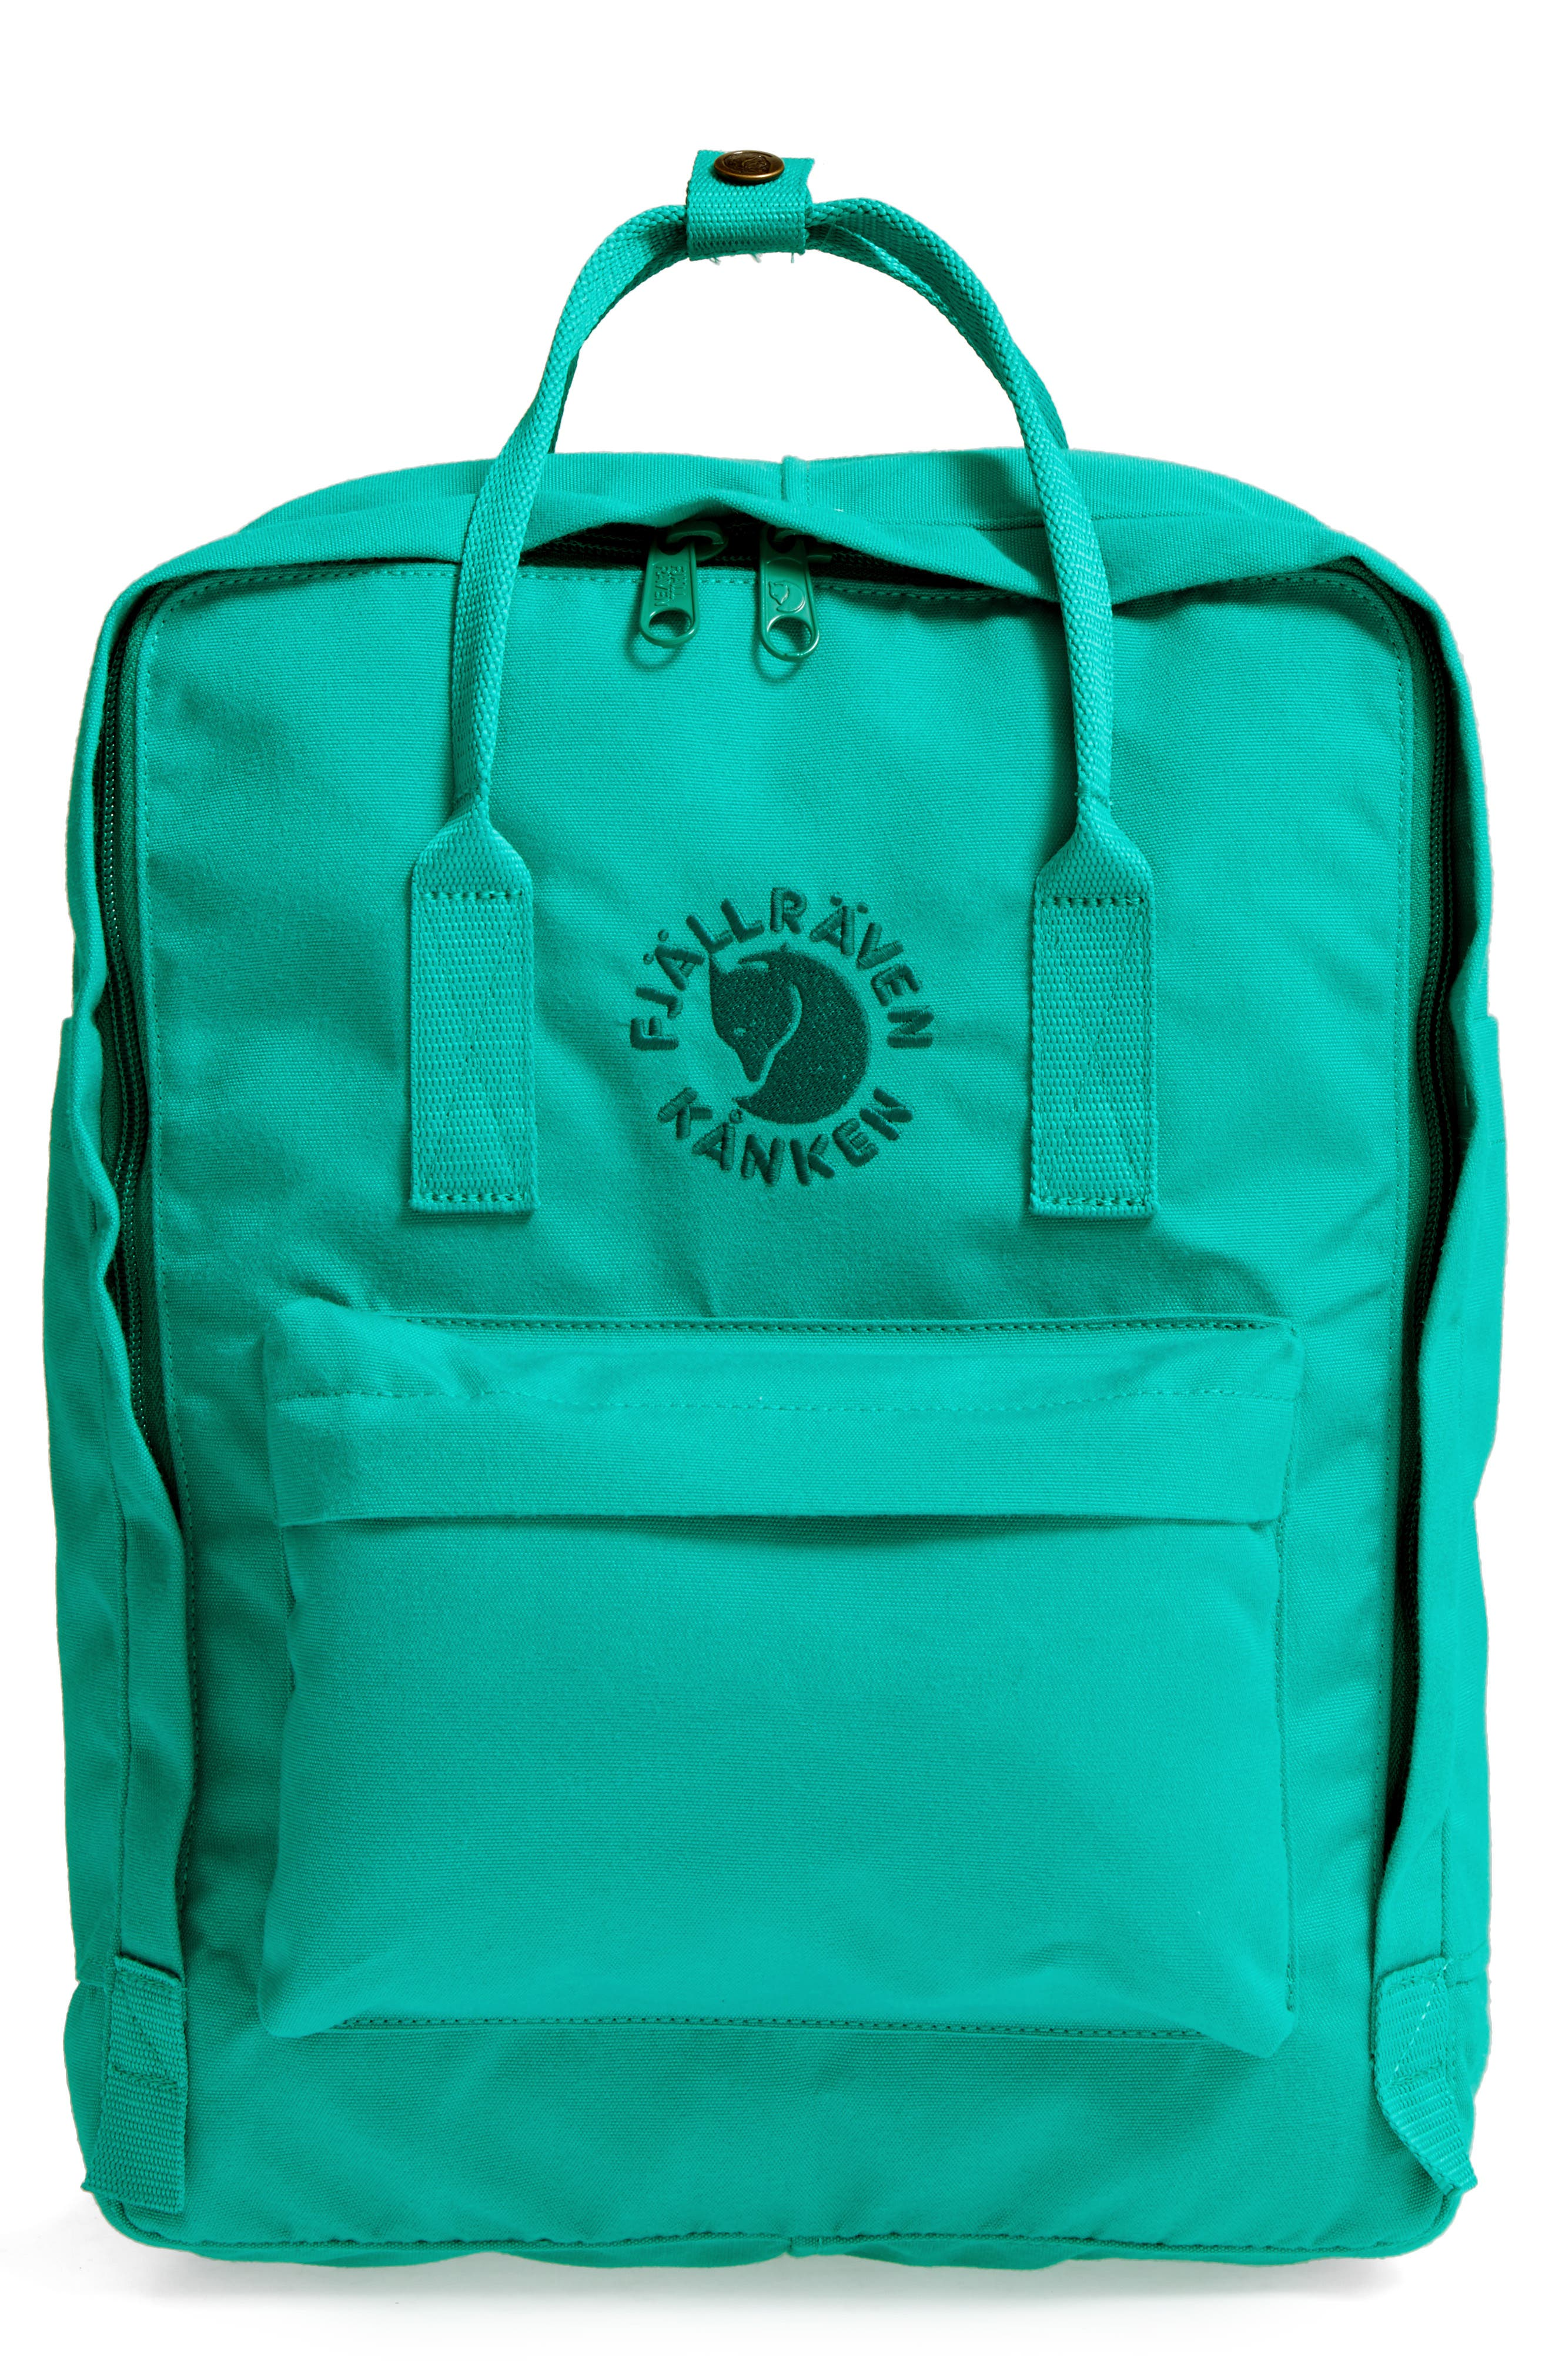 Re-Kånken Water Resistant Backpack,                             Main thumbnail 1, color,                             EMERALD